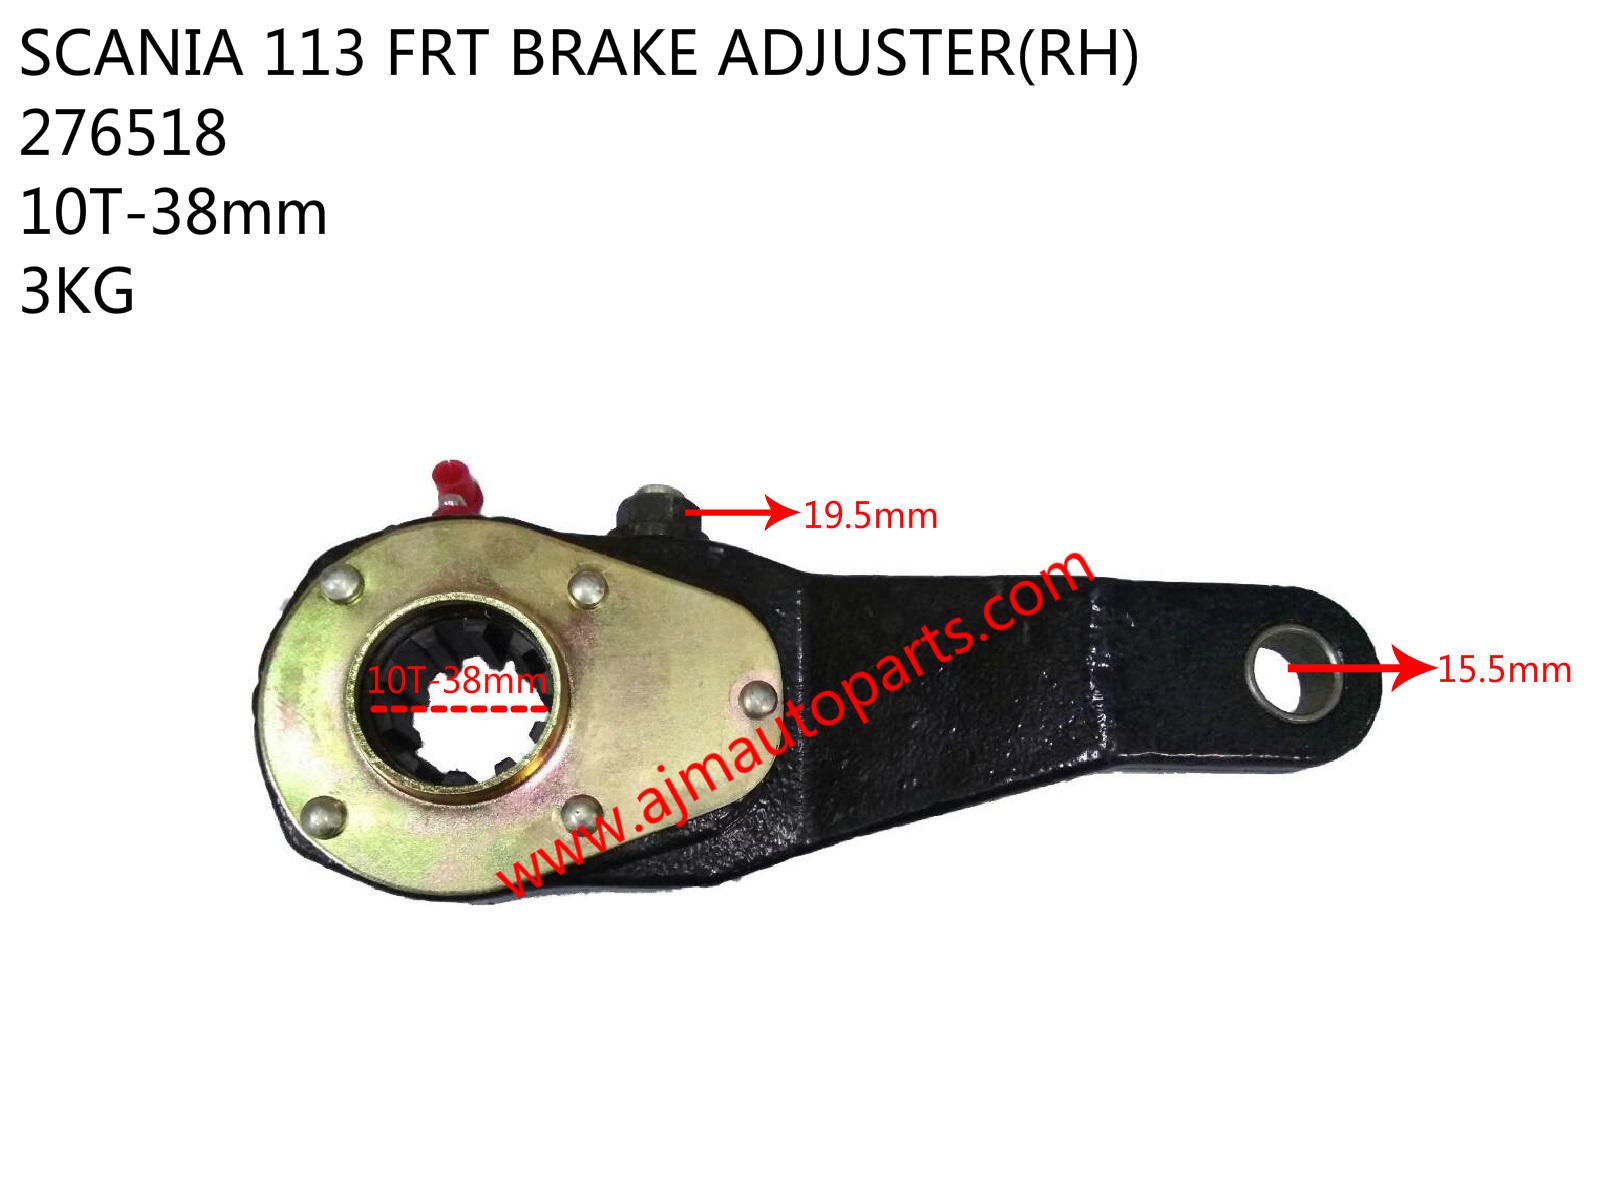 SCANIA 113 FRT BRAKE ADJUSTER-RH-276518